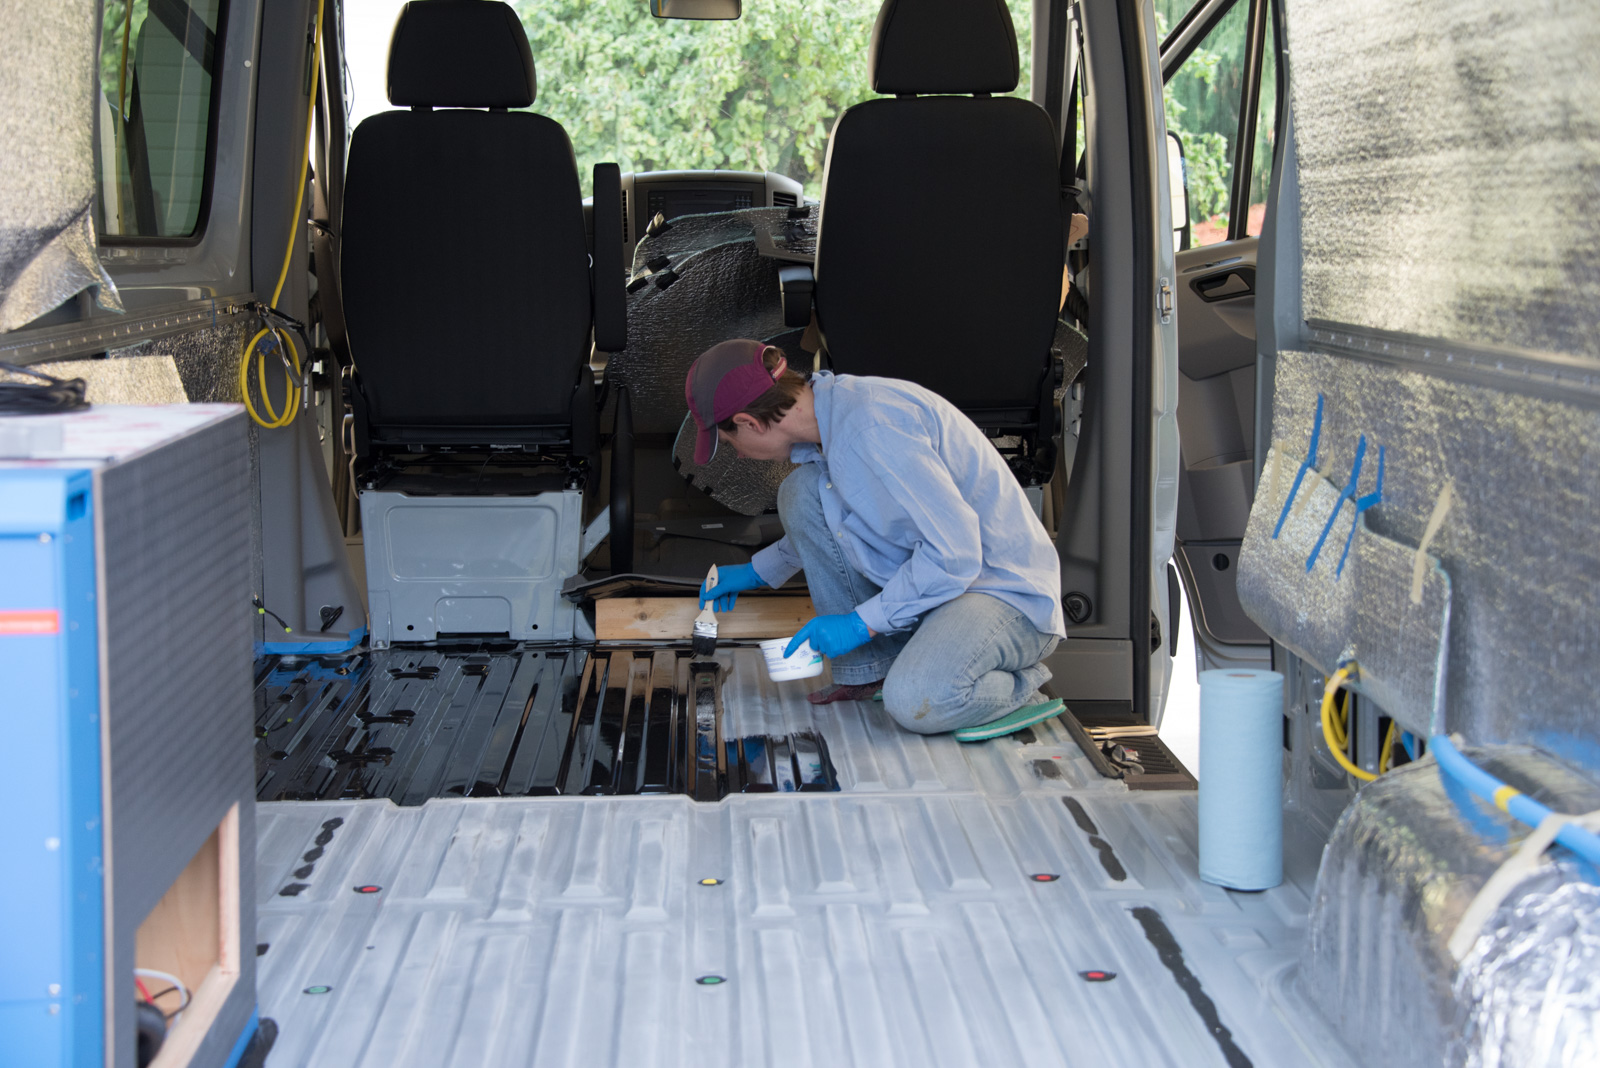 Van floor prep with POR15